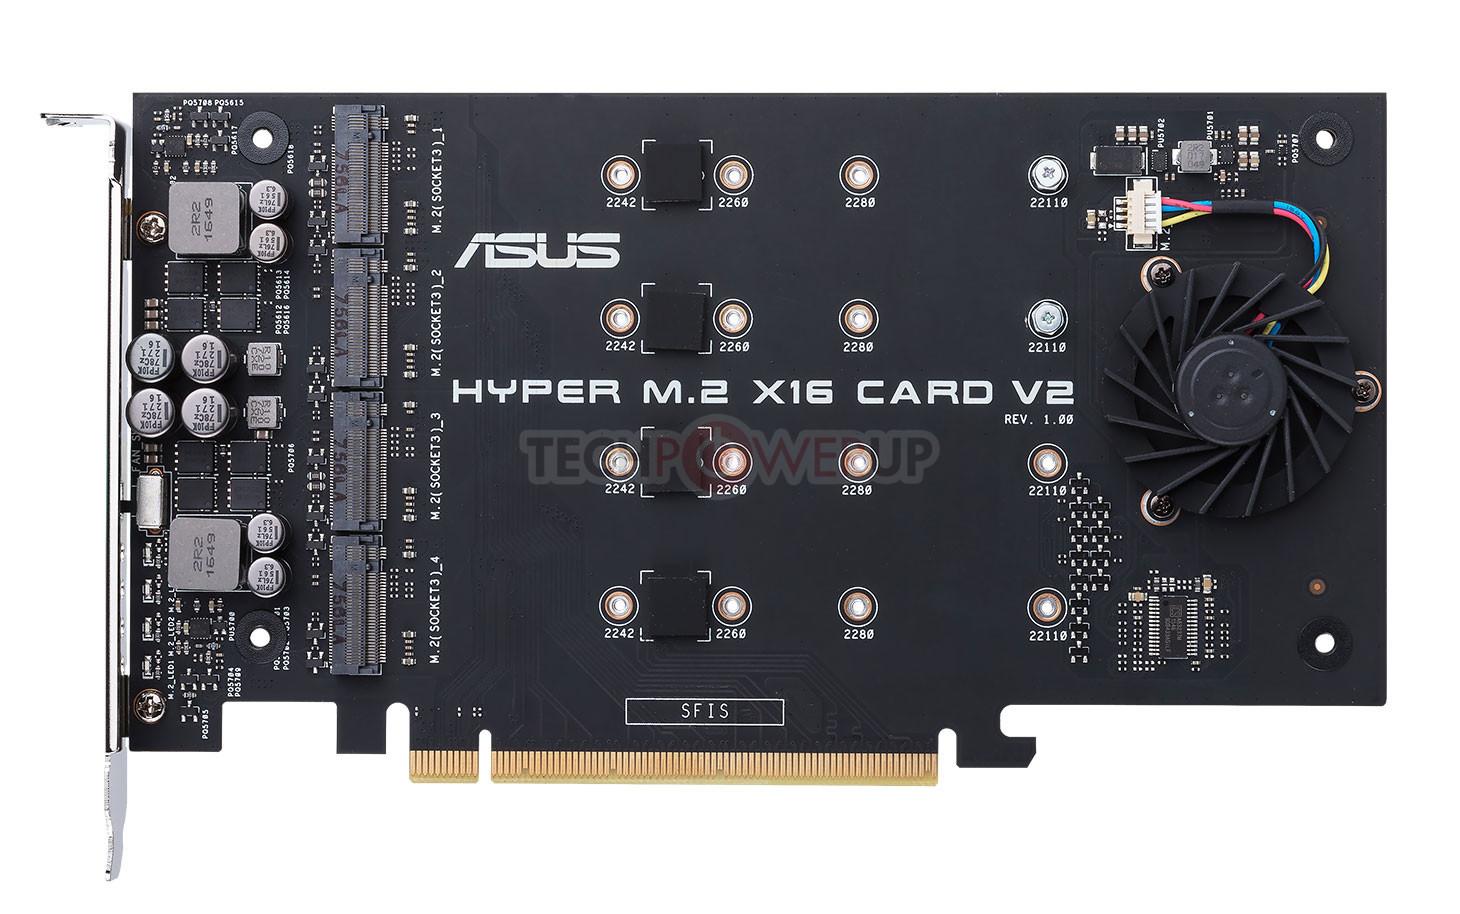 ASUS Rolls Out the Hyper M 2 x16 V2 NVMe RAID Card | TechPowerUp